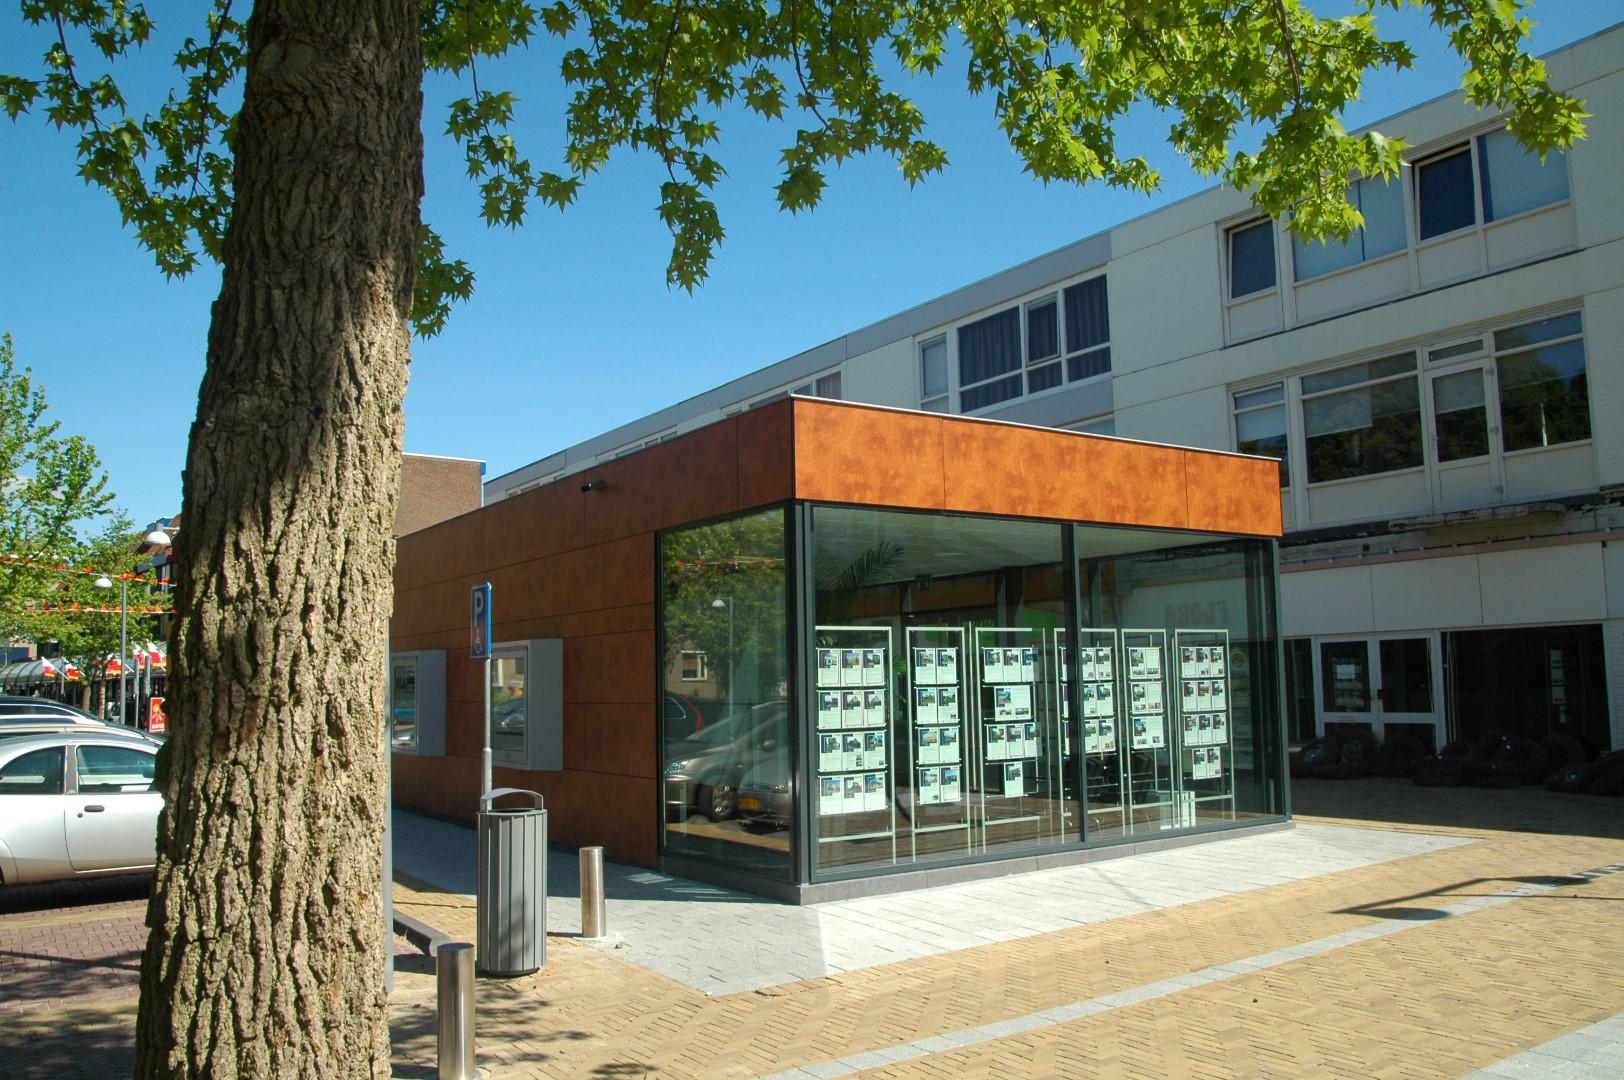 stoel_architect_Kampen_nieuwbouw_winkelcentrum Emmeloord (6) (Large)